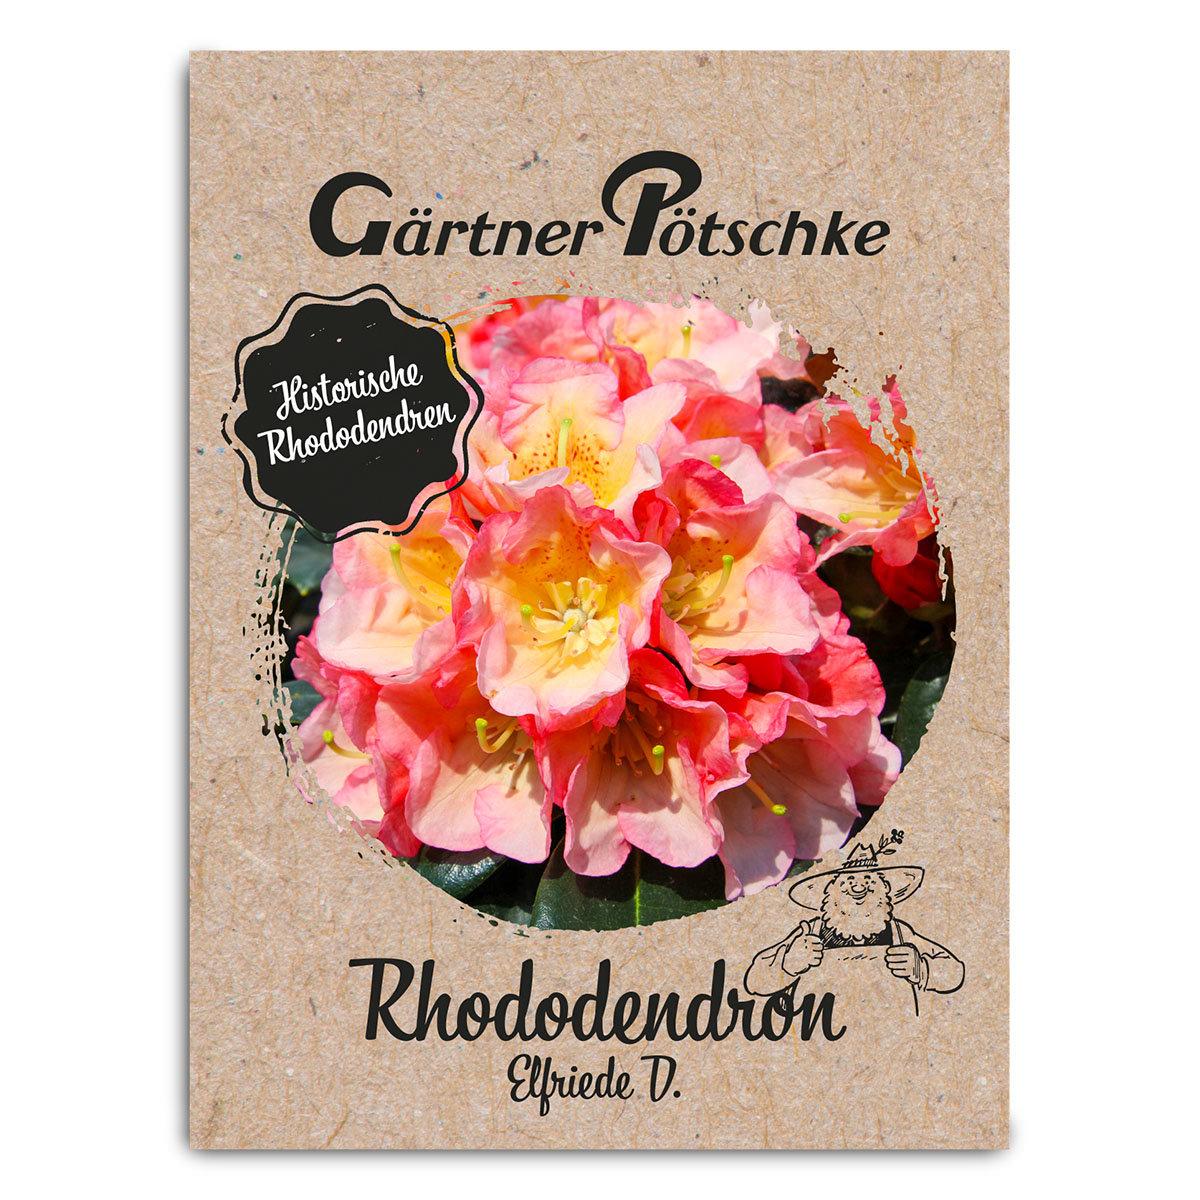 Historischer Rhododendron Elfriede D., im ca. 23 cm-Topf